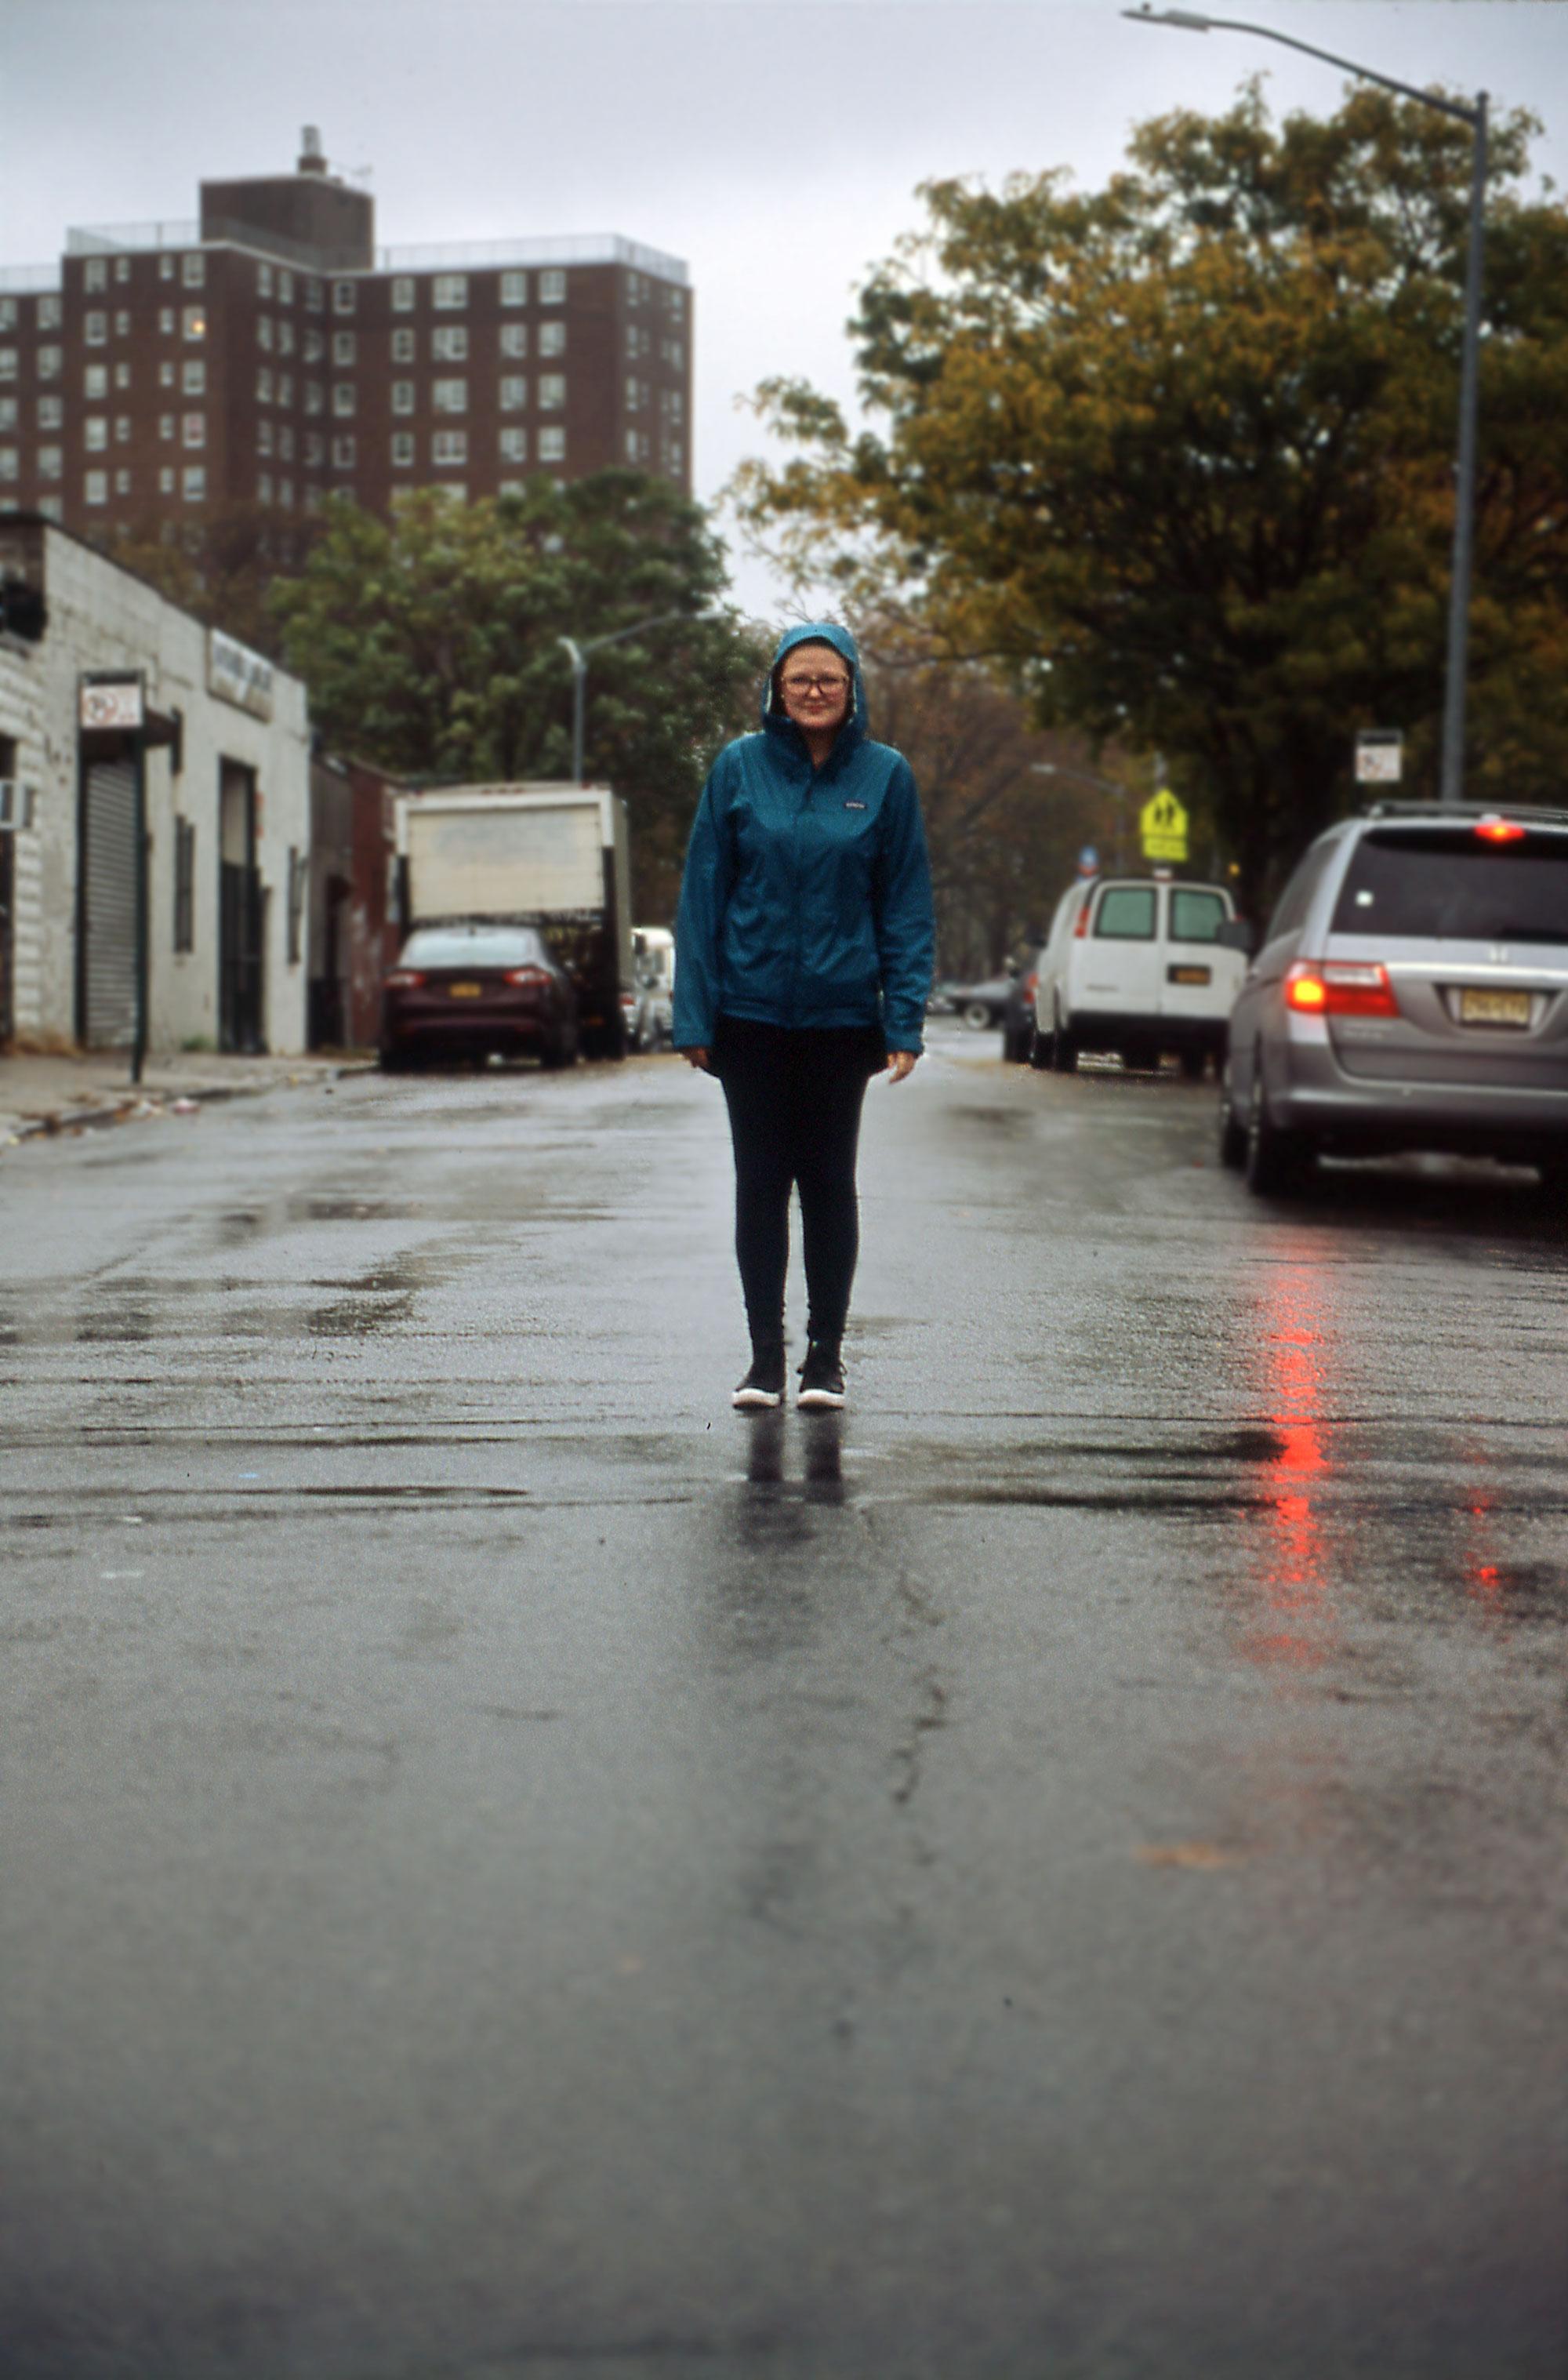 171215_NYC_Oct-Dec_021.jpg